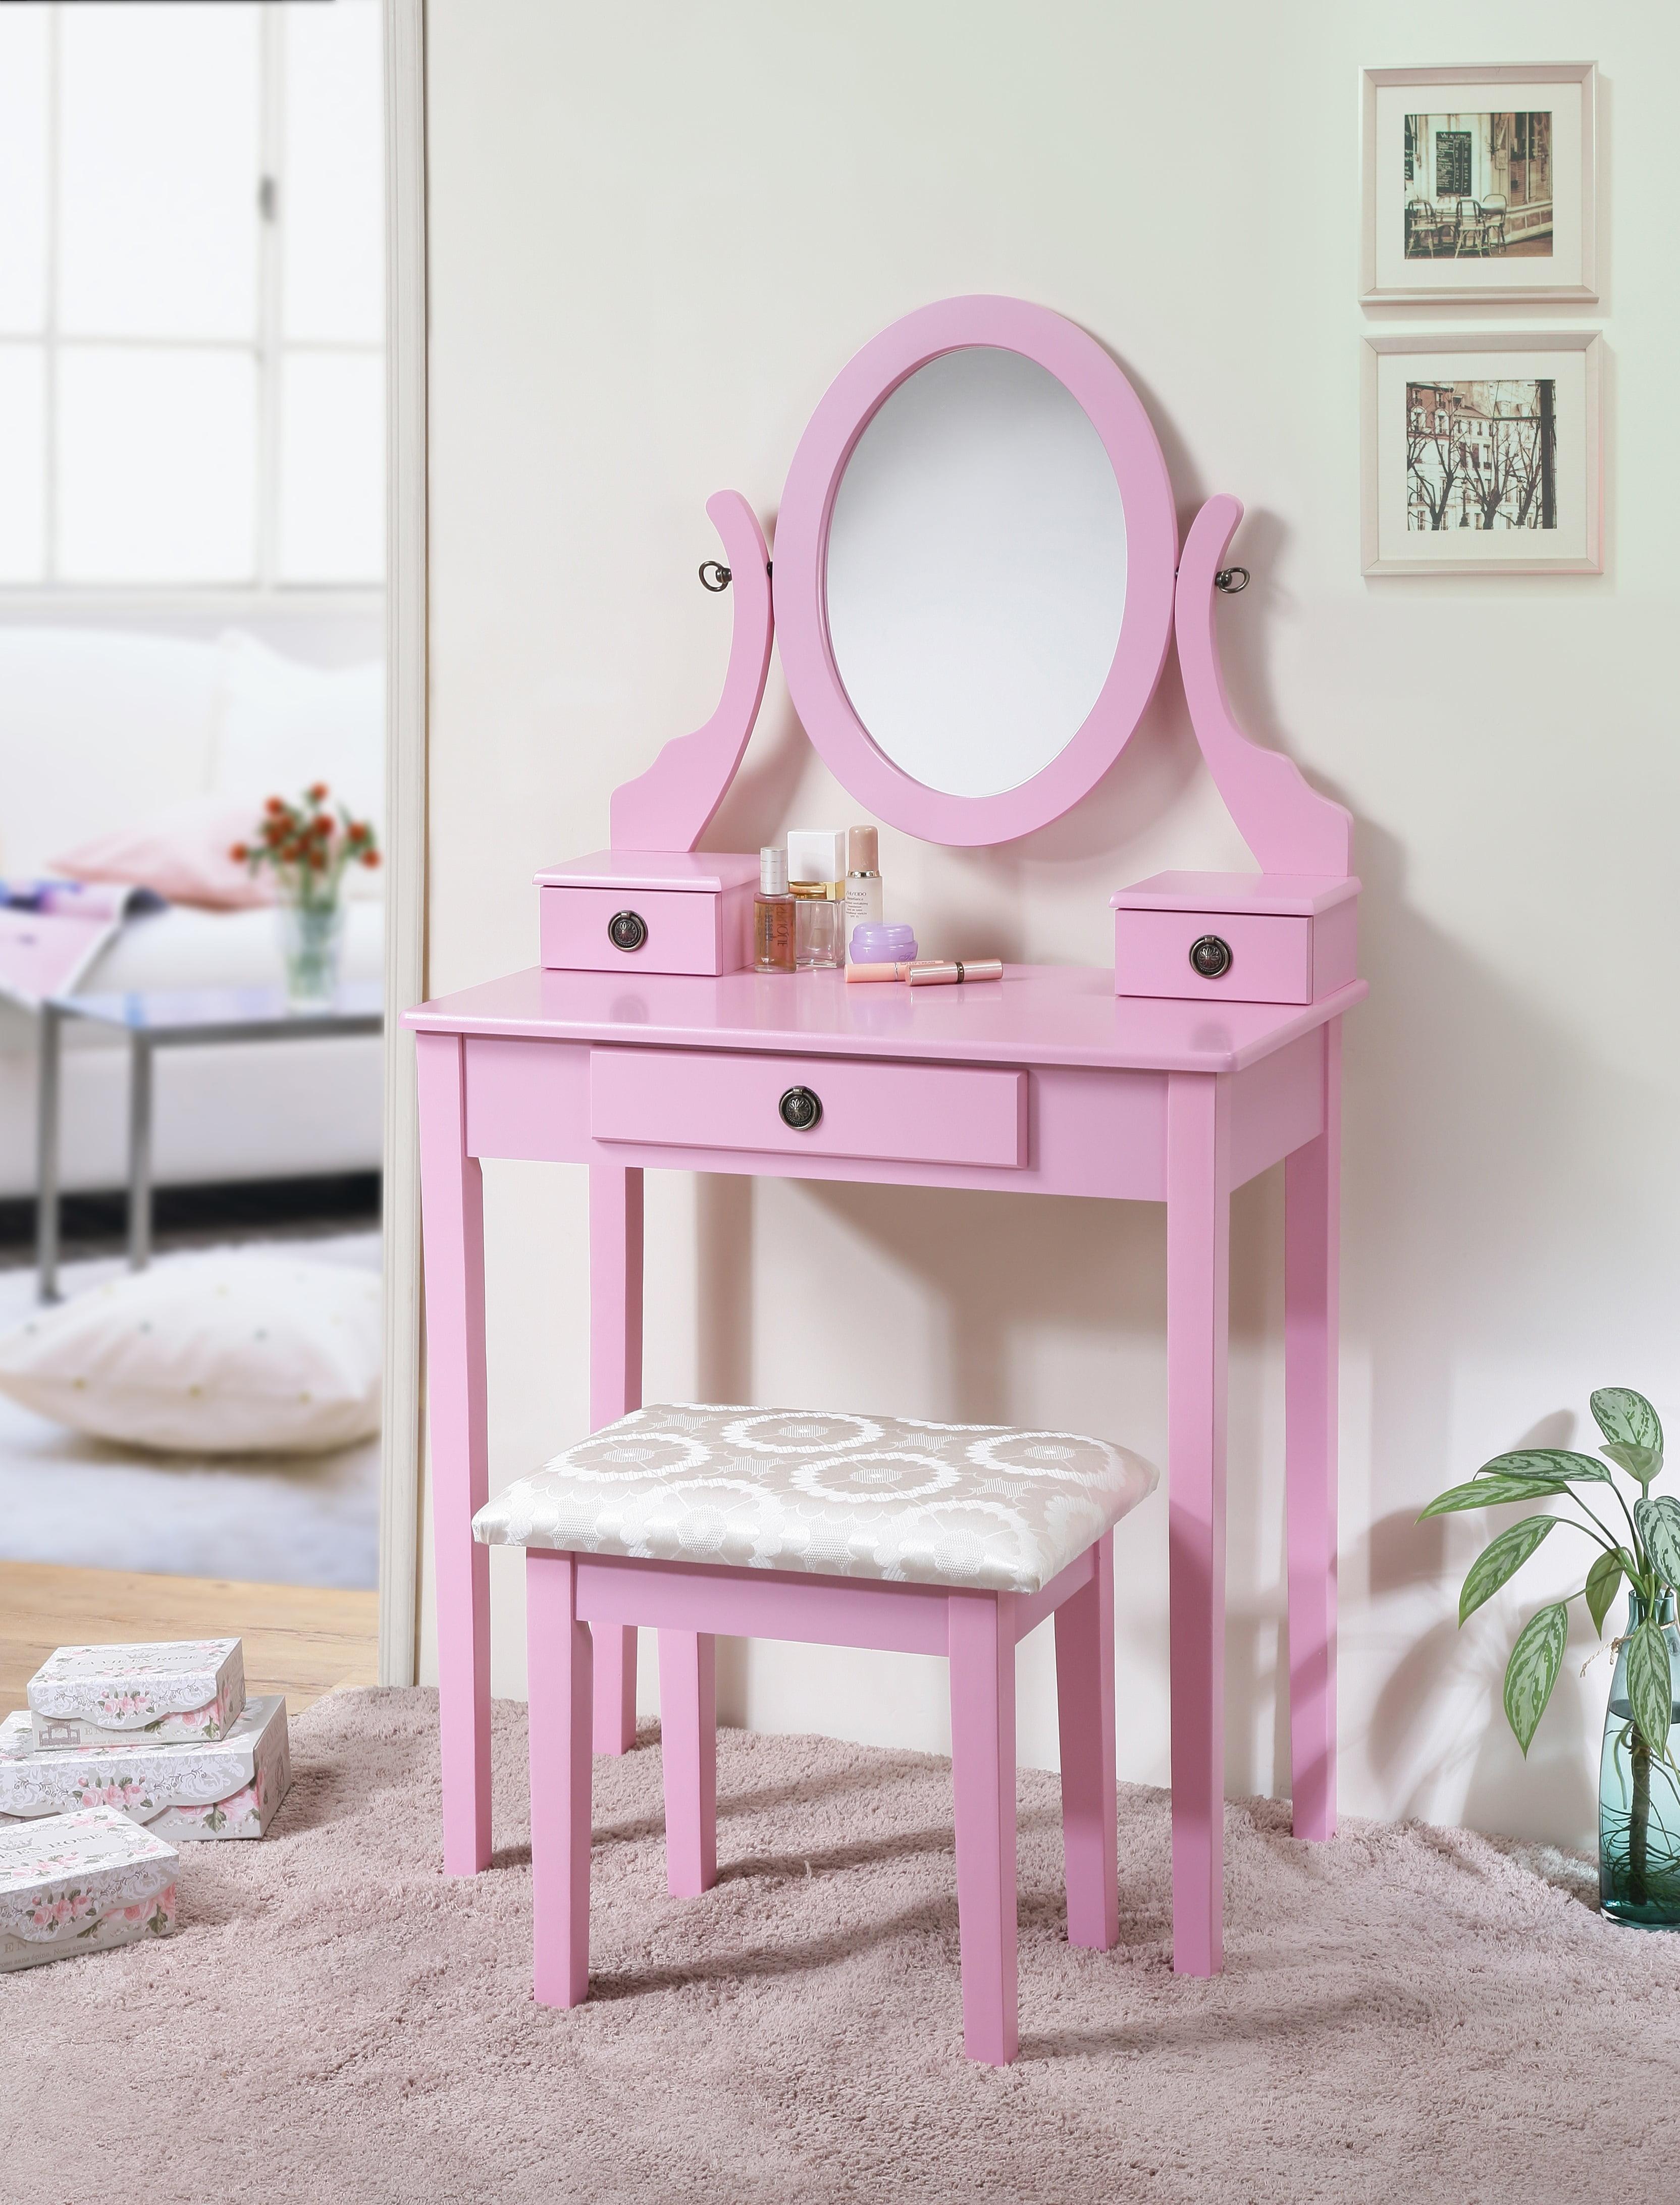 Roundhill Furniture Moniya White Wood Vanity Table and Stool Set by RHF